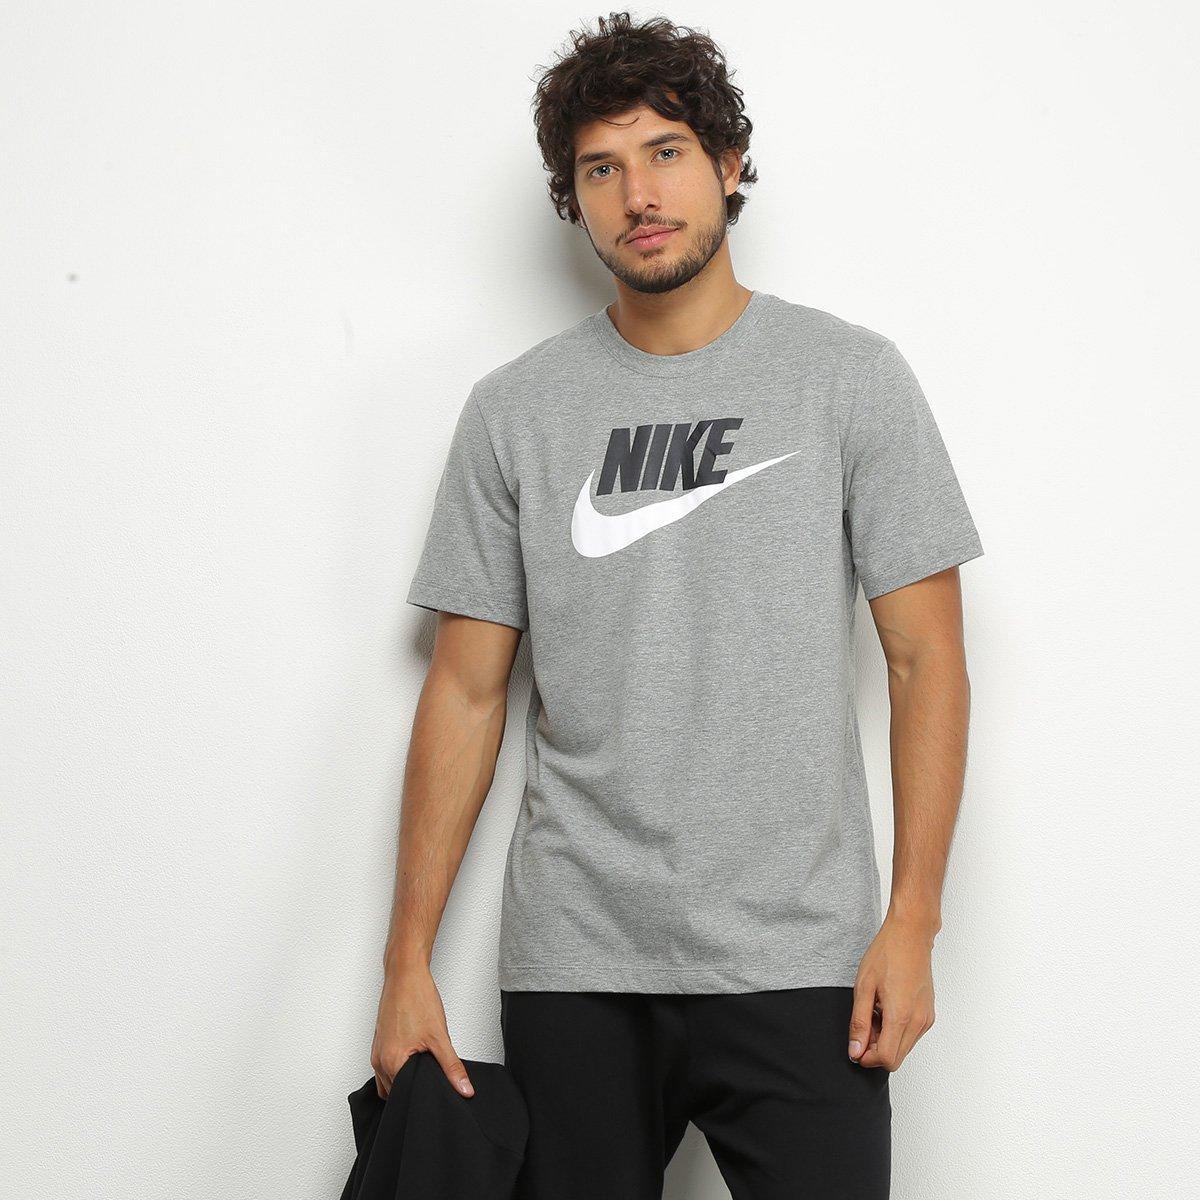 Camiseta Nike Masculina Sportwear Icon Futura Cinza e Preta